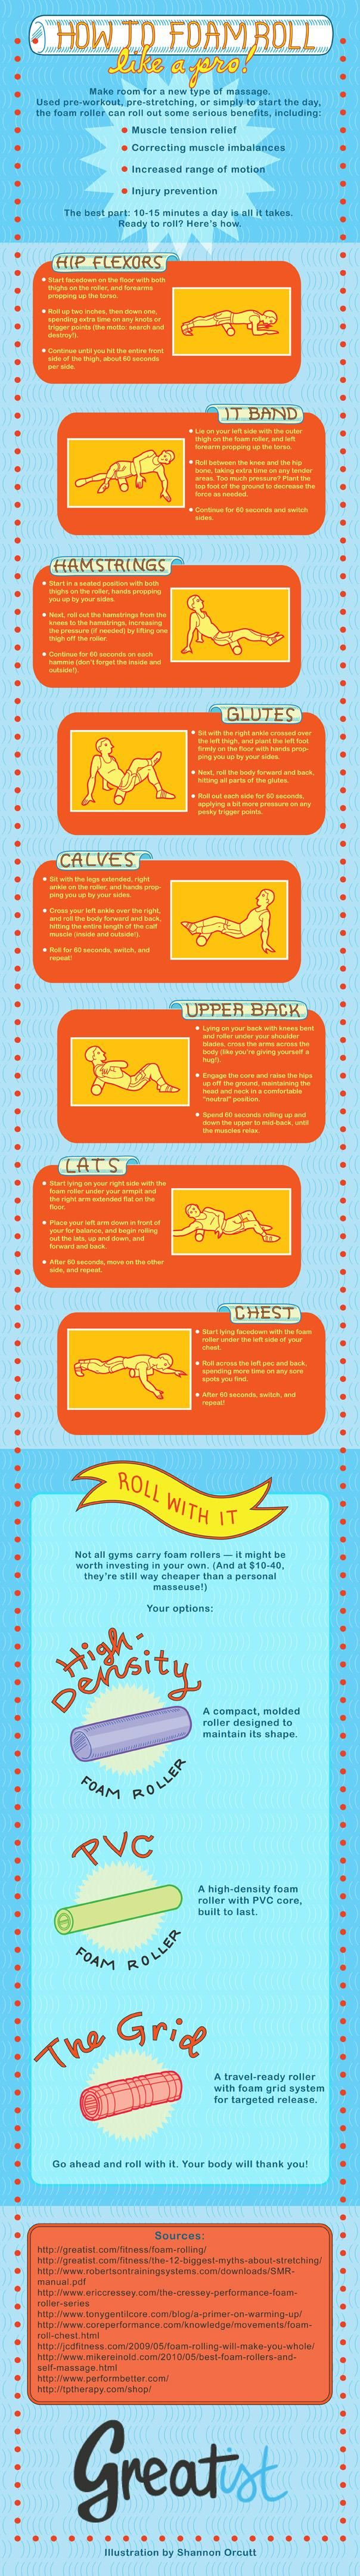 Benefits of Foam Rolling for Muscle Recovery: foam rolling guide